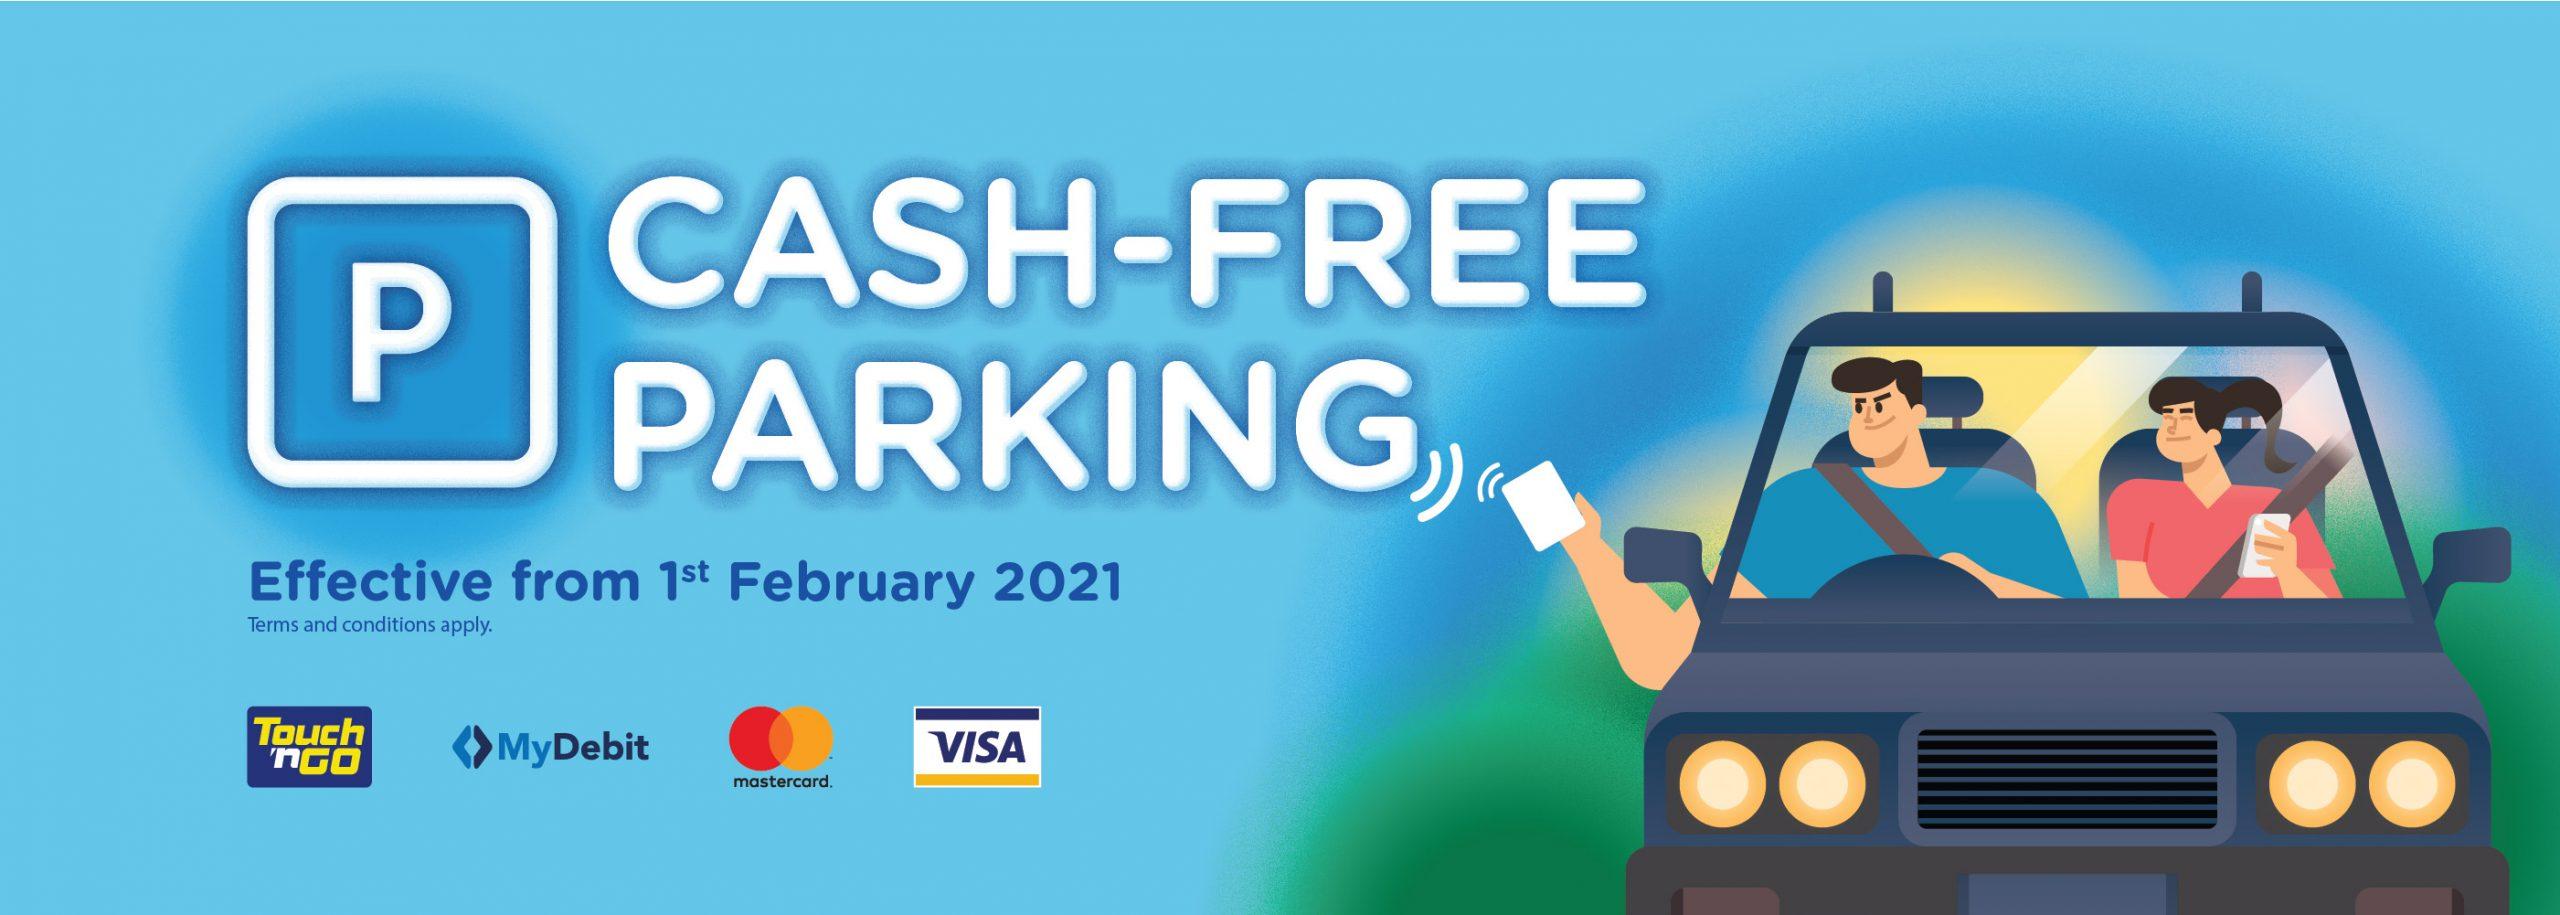 IPC Free Parking Promo